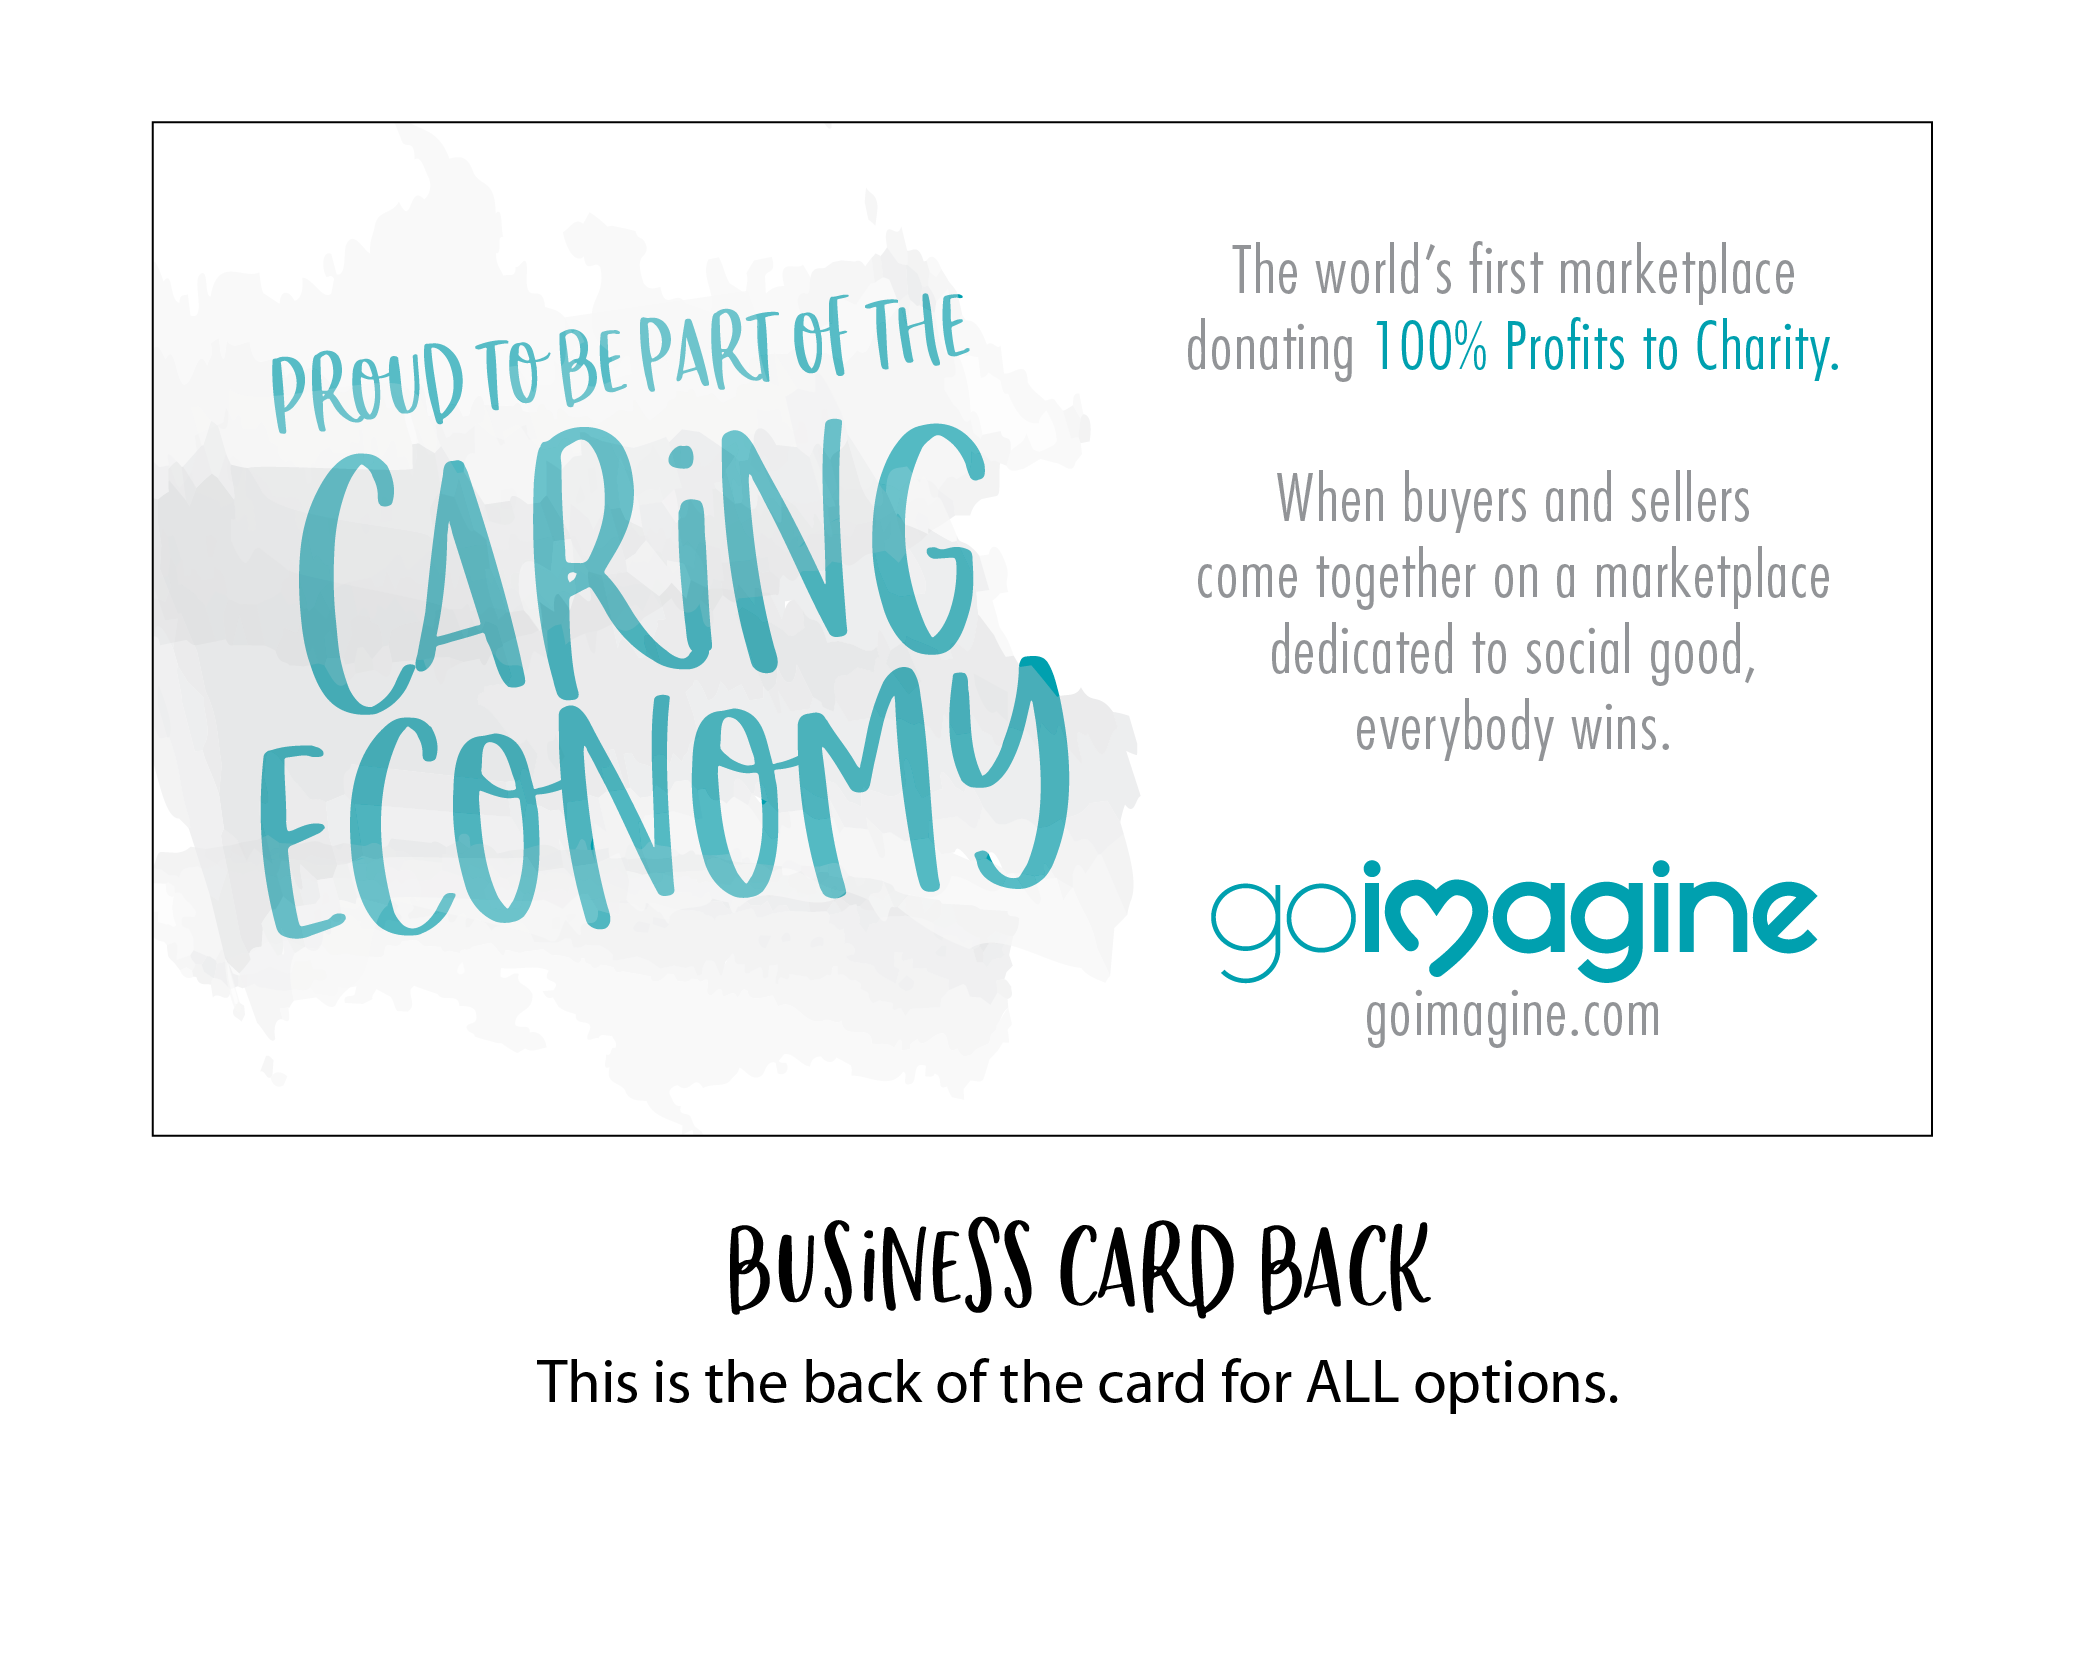 goimagine custom business card back